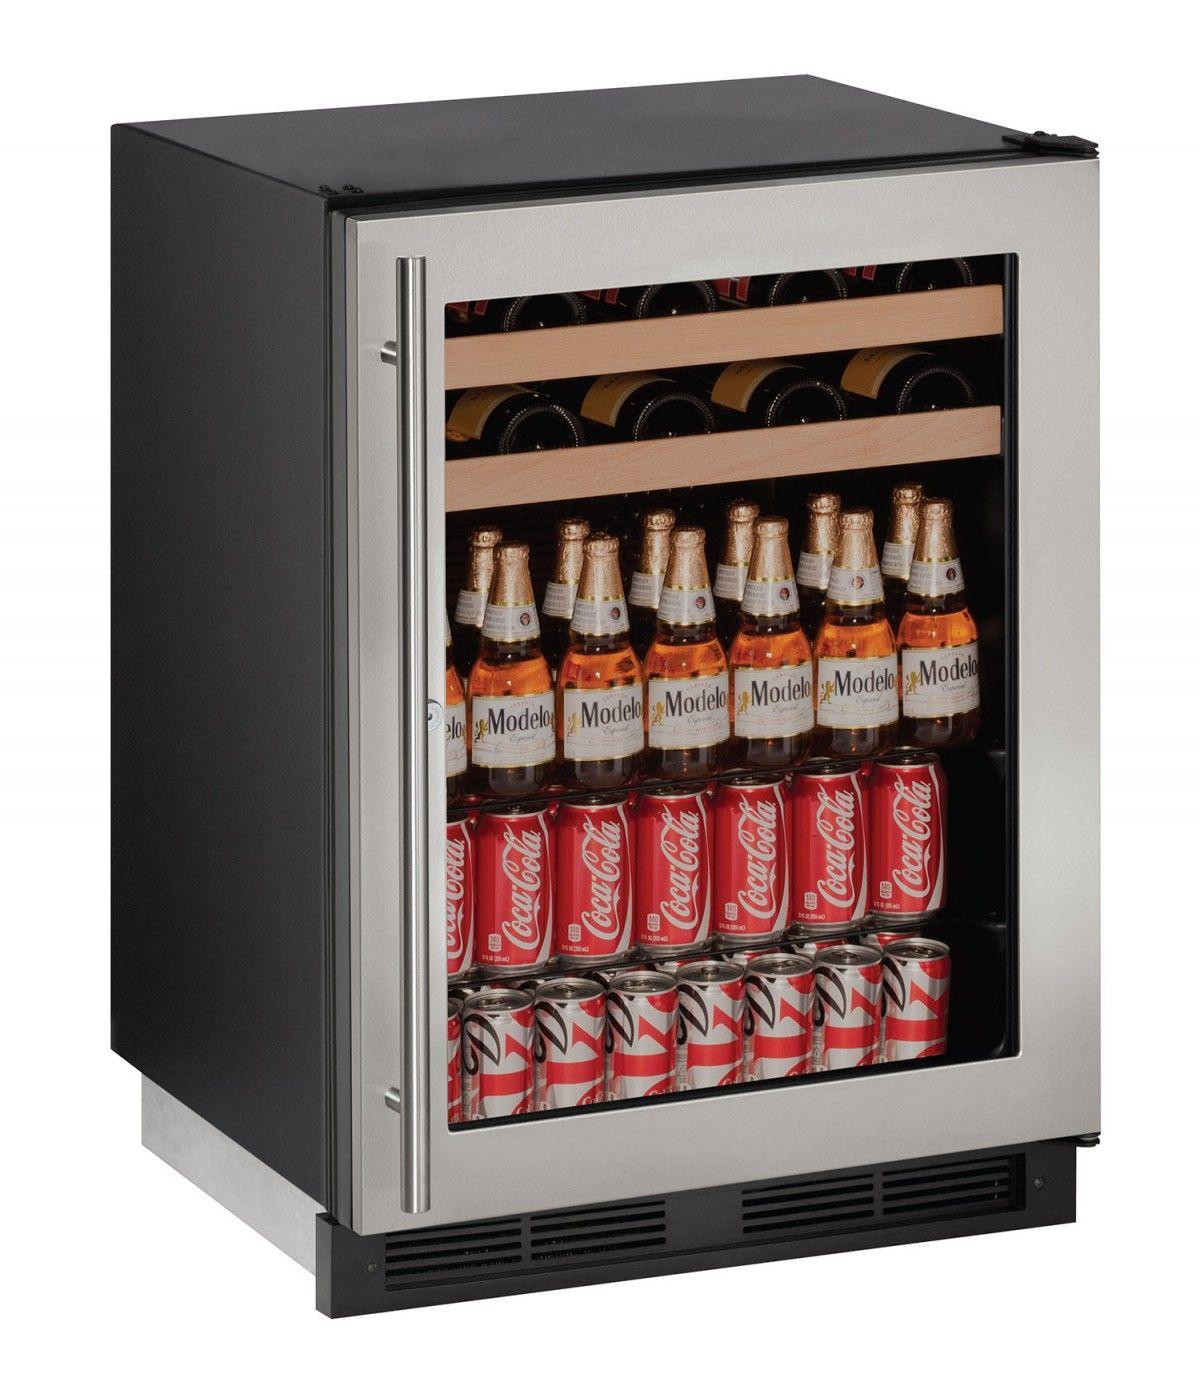 1224bev 24 Beverage Center Beverage Centers Products Beverage Center Built In Beverage Cooler Beverage Refrigerator